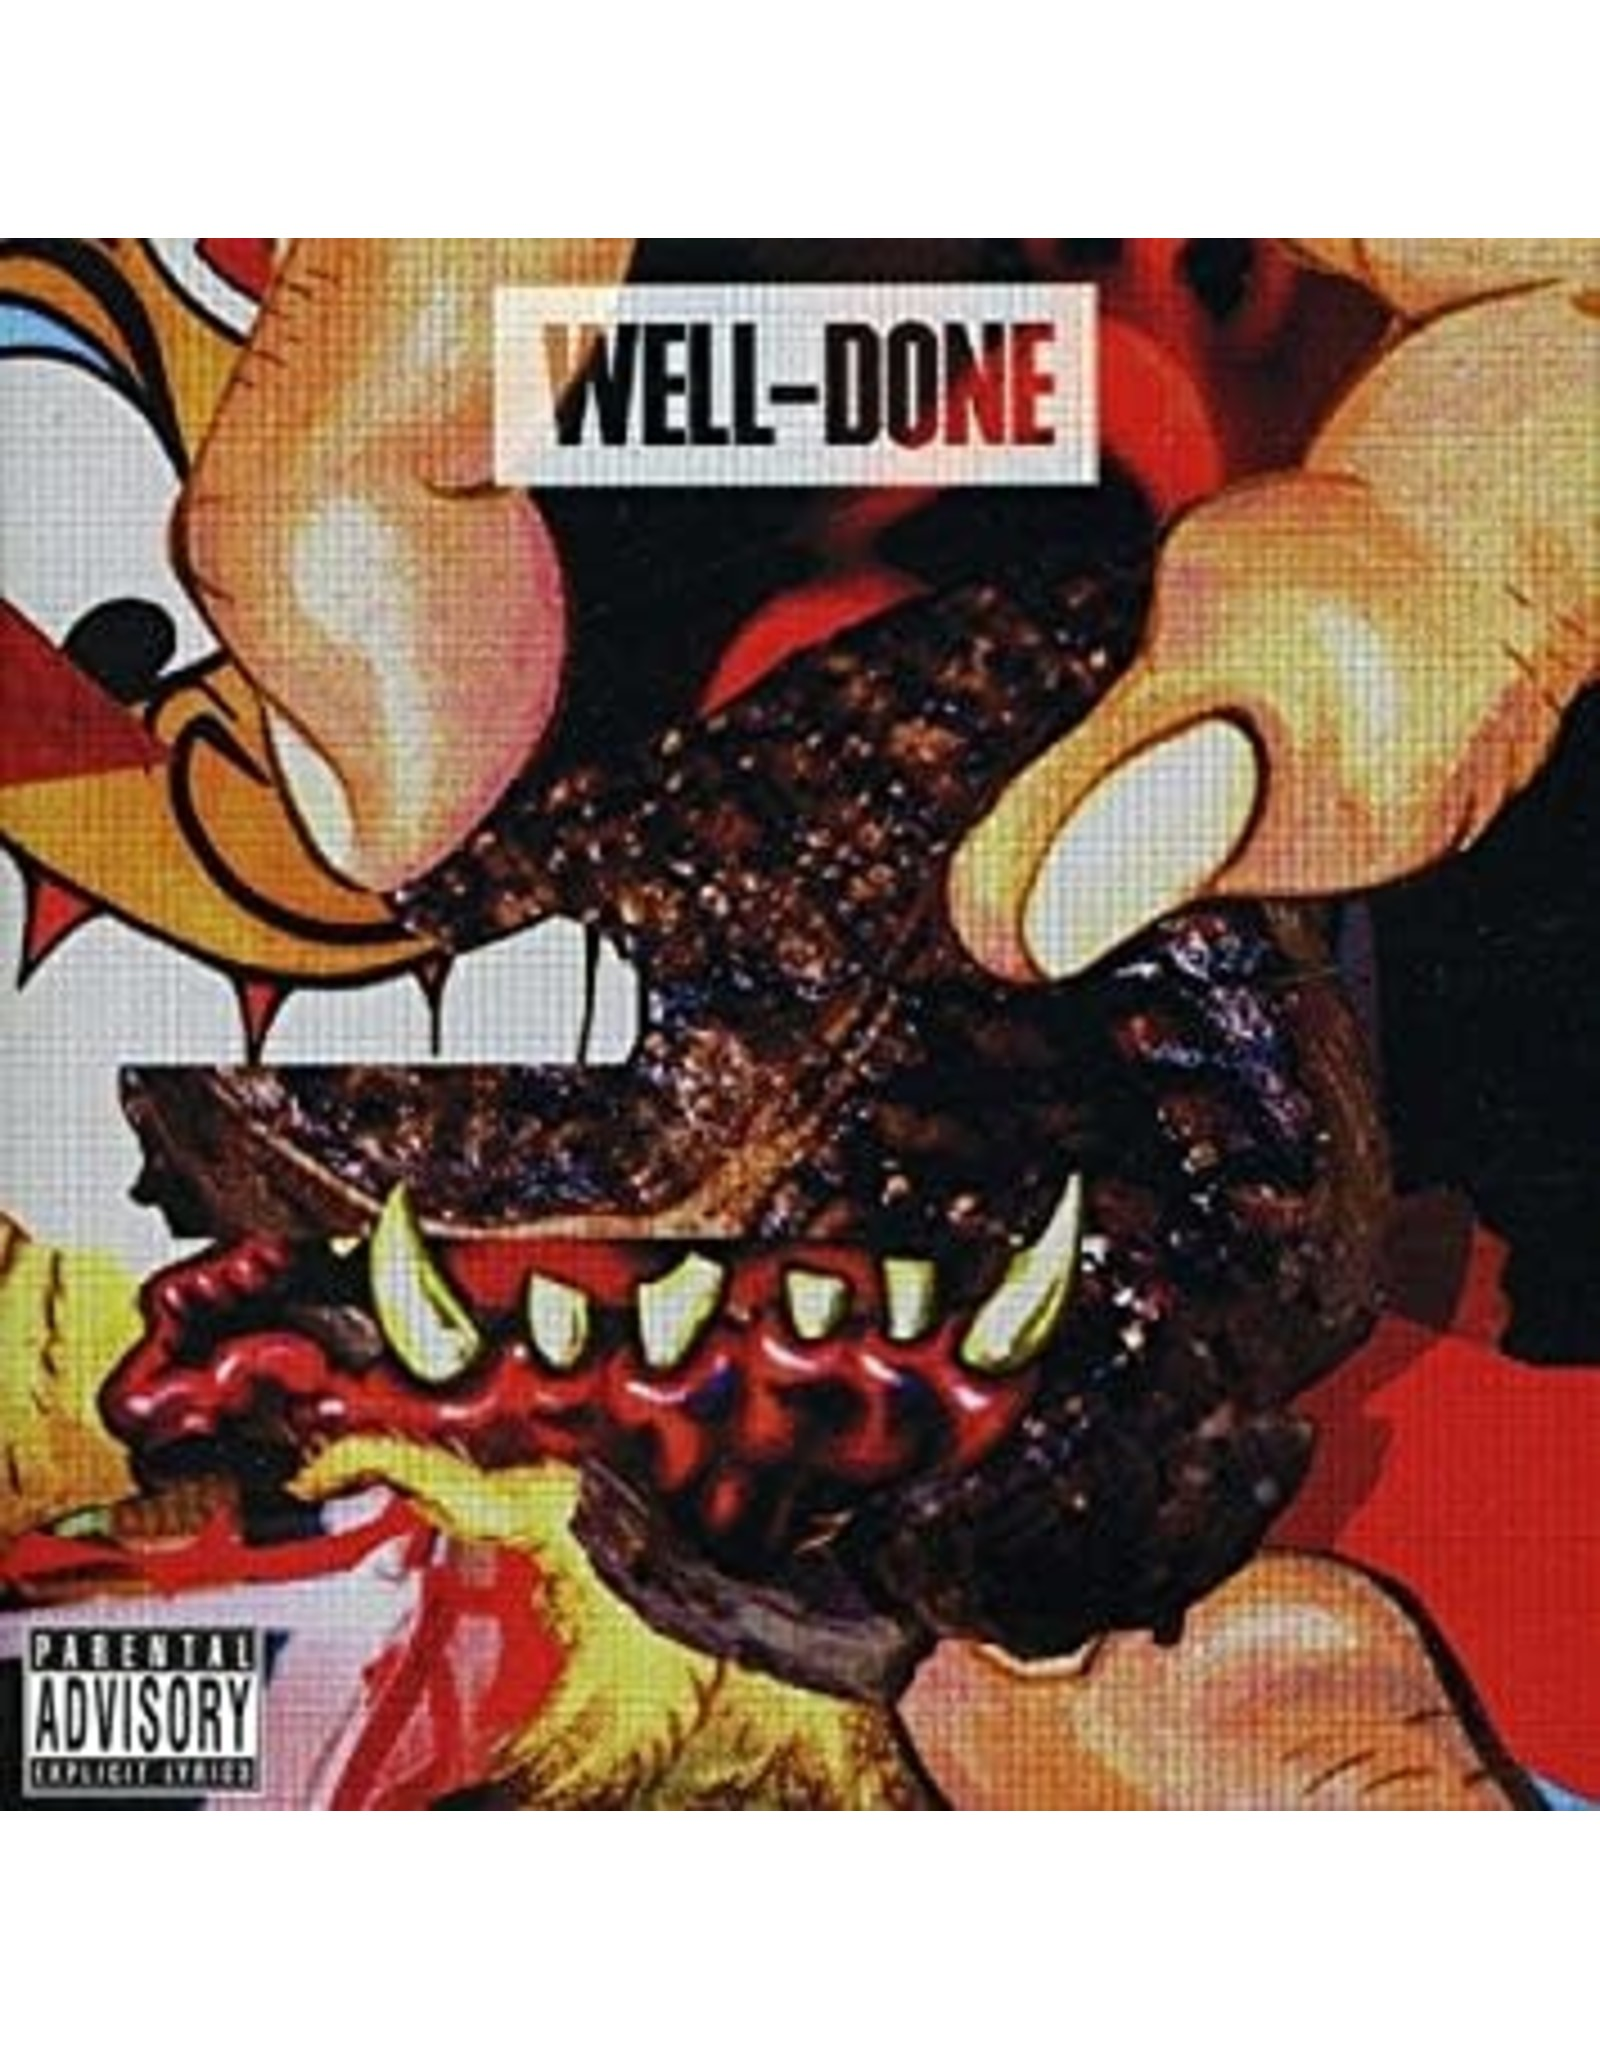 New Vinyl Action Bronson & Statik Selektah - Well Done (Colored) 2LP